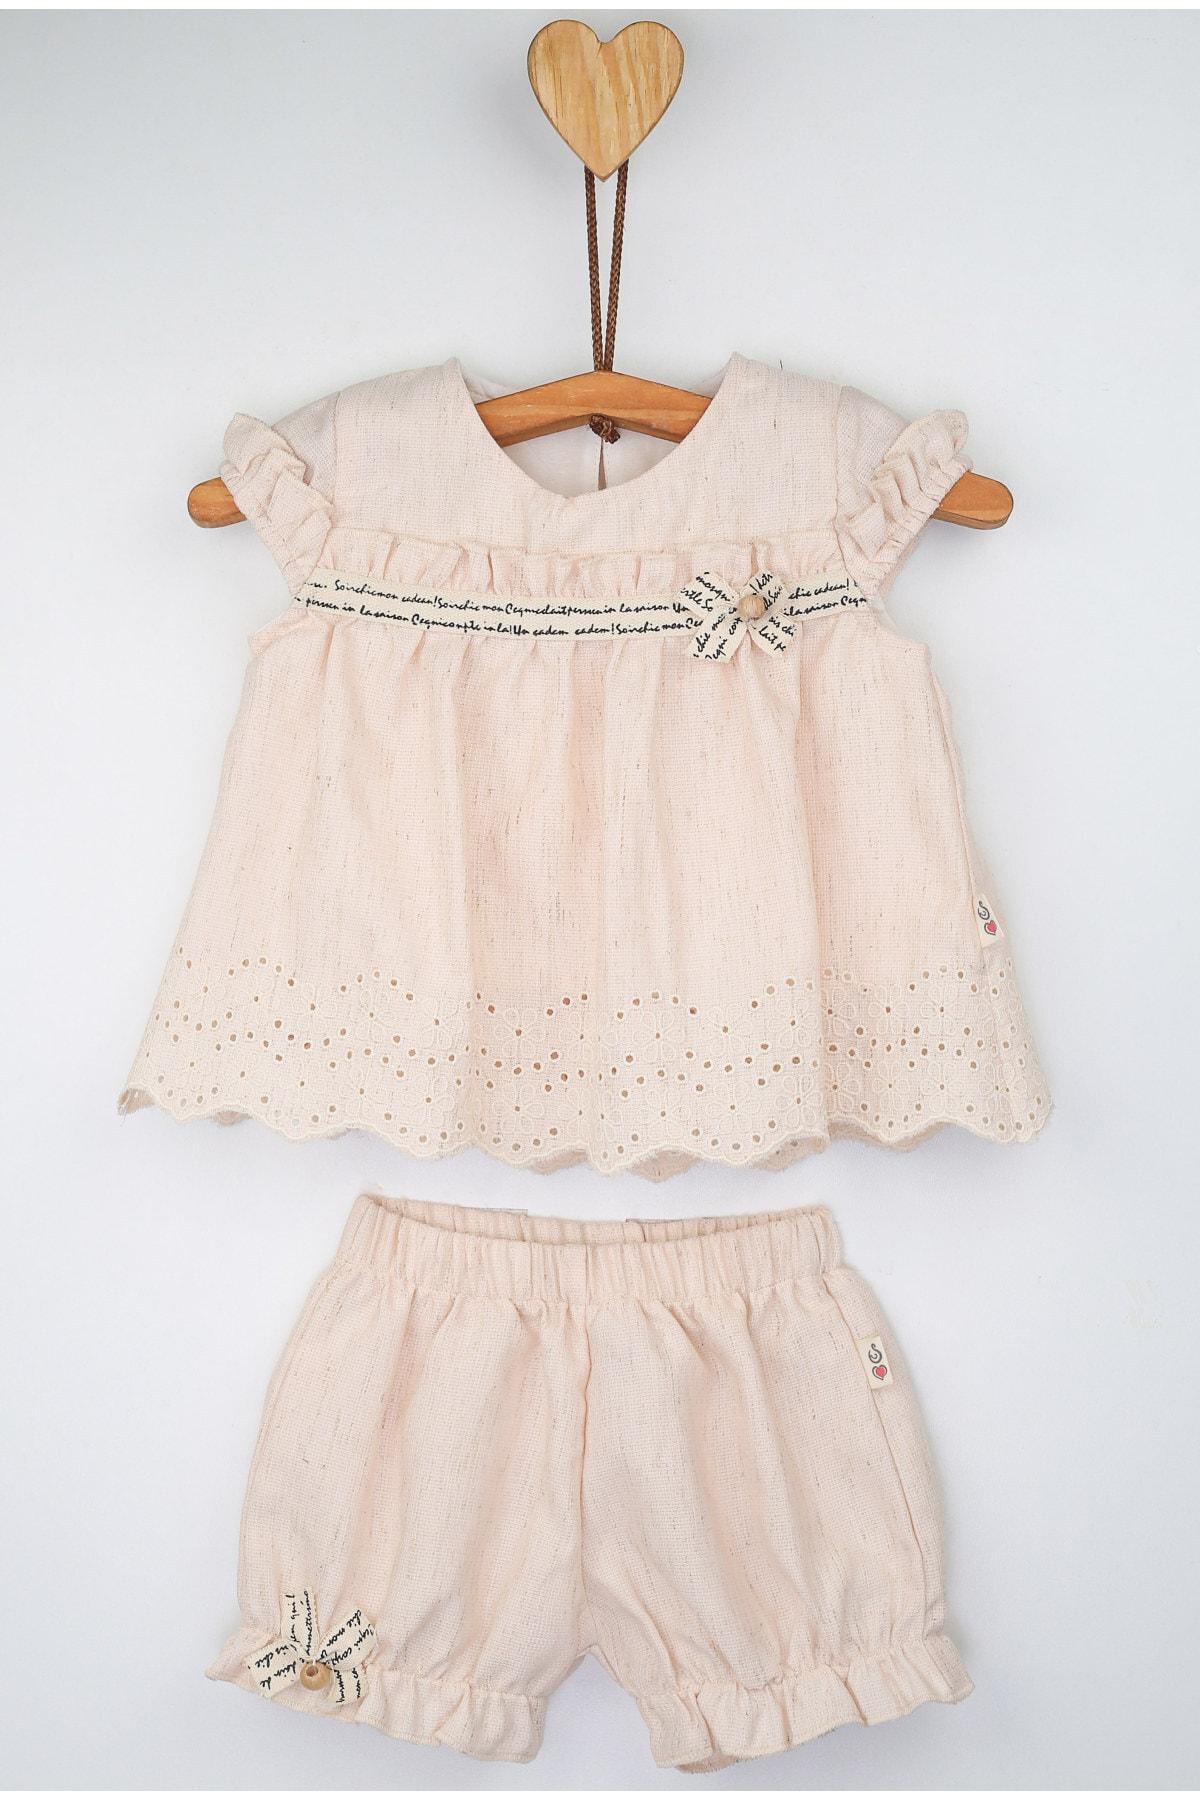 Lilax Brode Desenli Bluz Lastikli Şort Takım 1